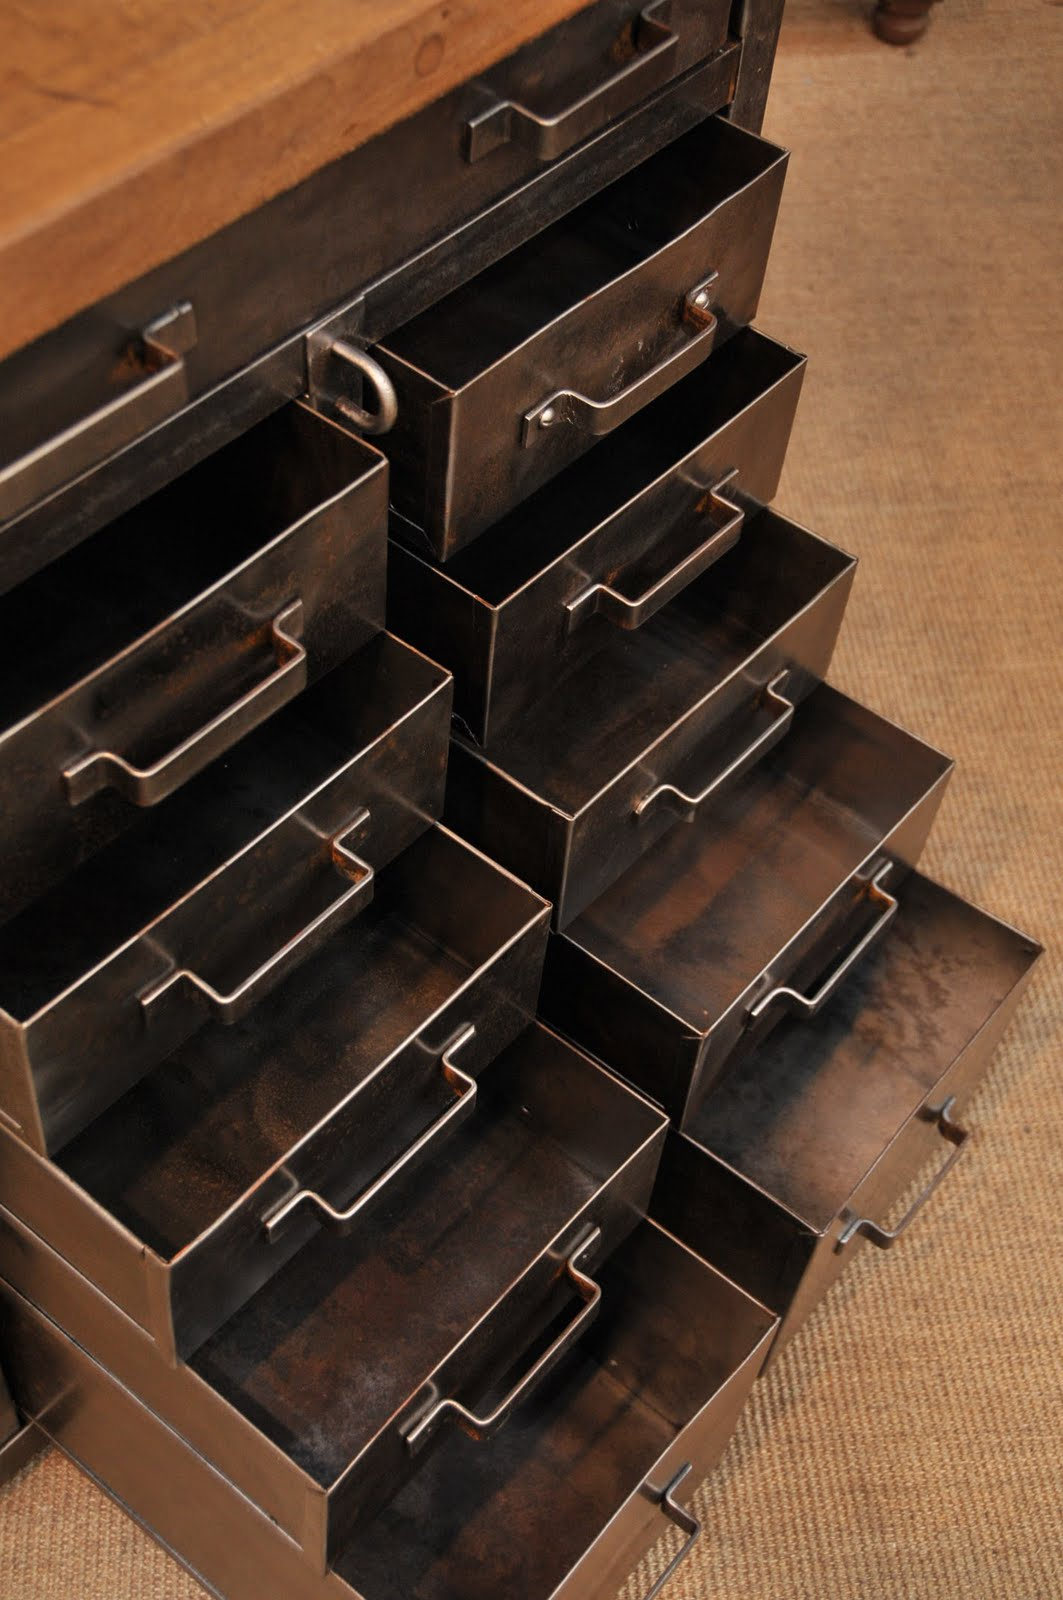 Le grenier brocante industrielle meubles de metier tiroirs for Meuble de metier brocante